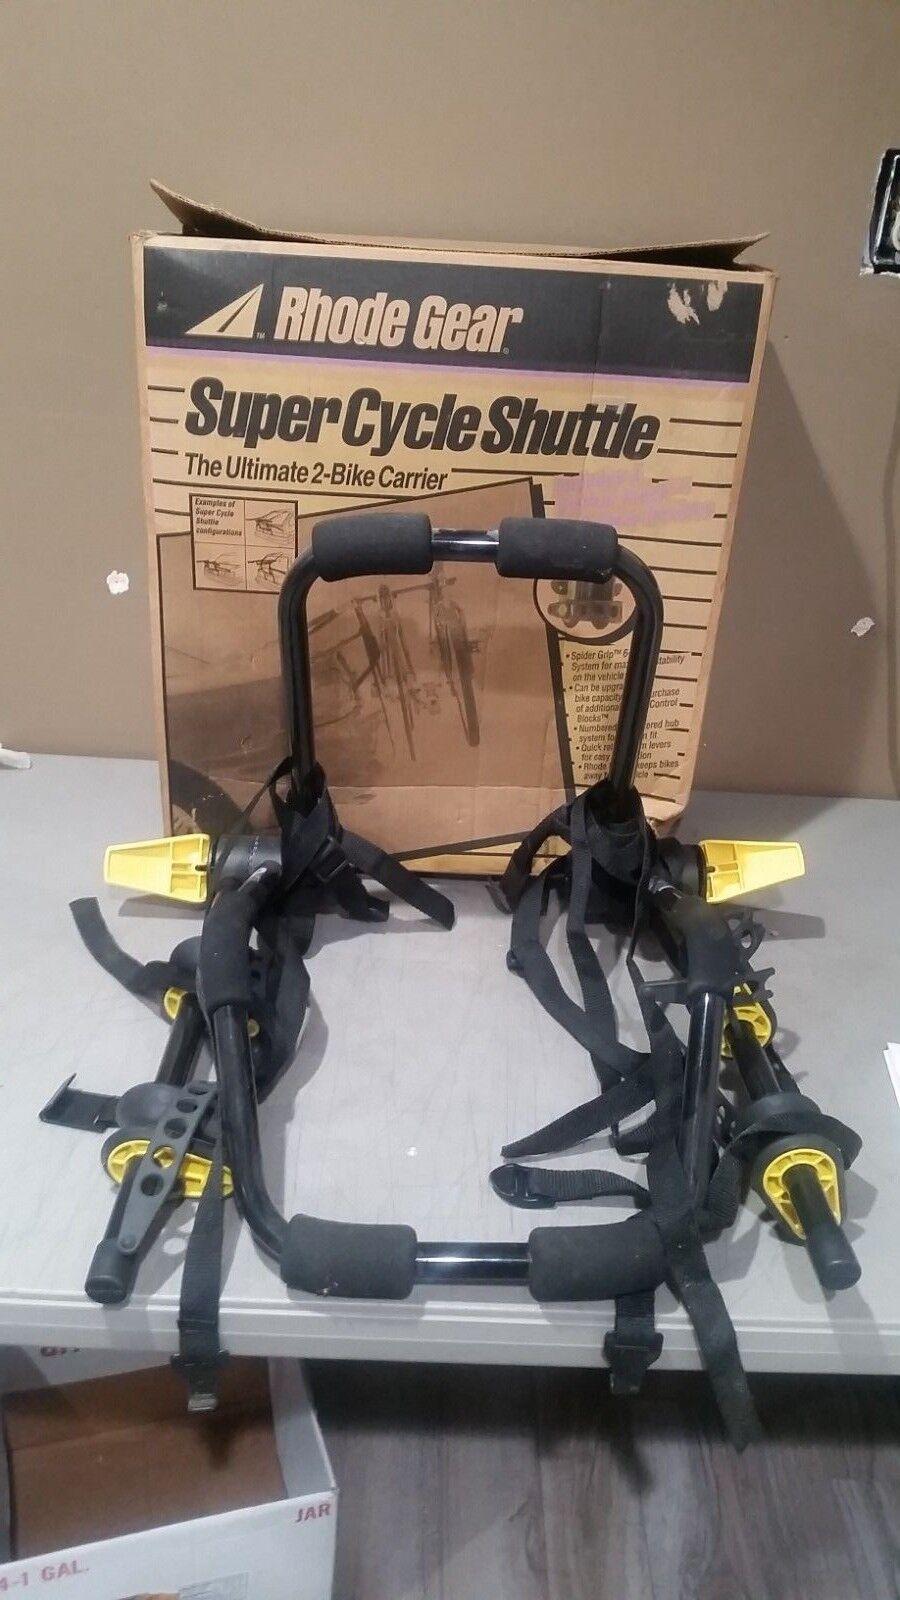 Rhode Gear 2-Bike Carrier Super Cycle Shuttle Trunk  Mount w  Manual FREE SHIP  brand outlet